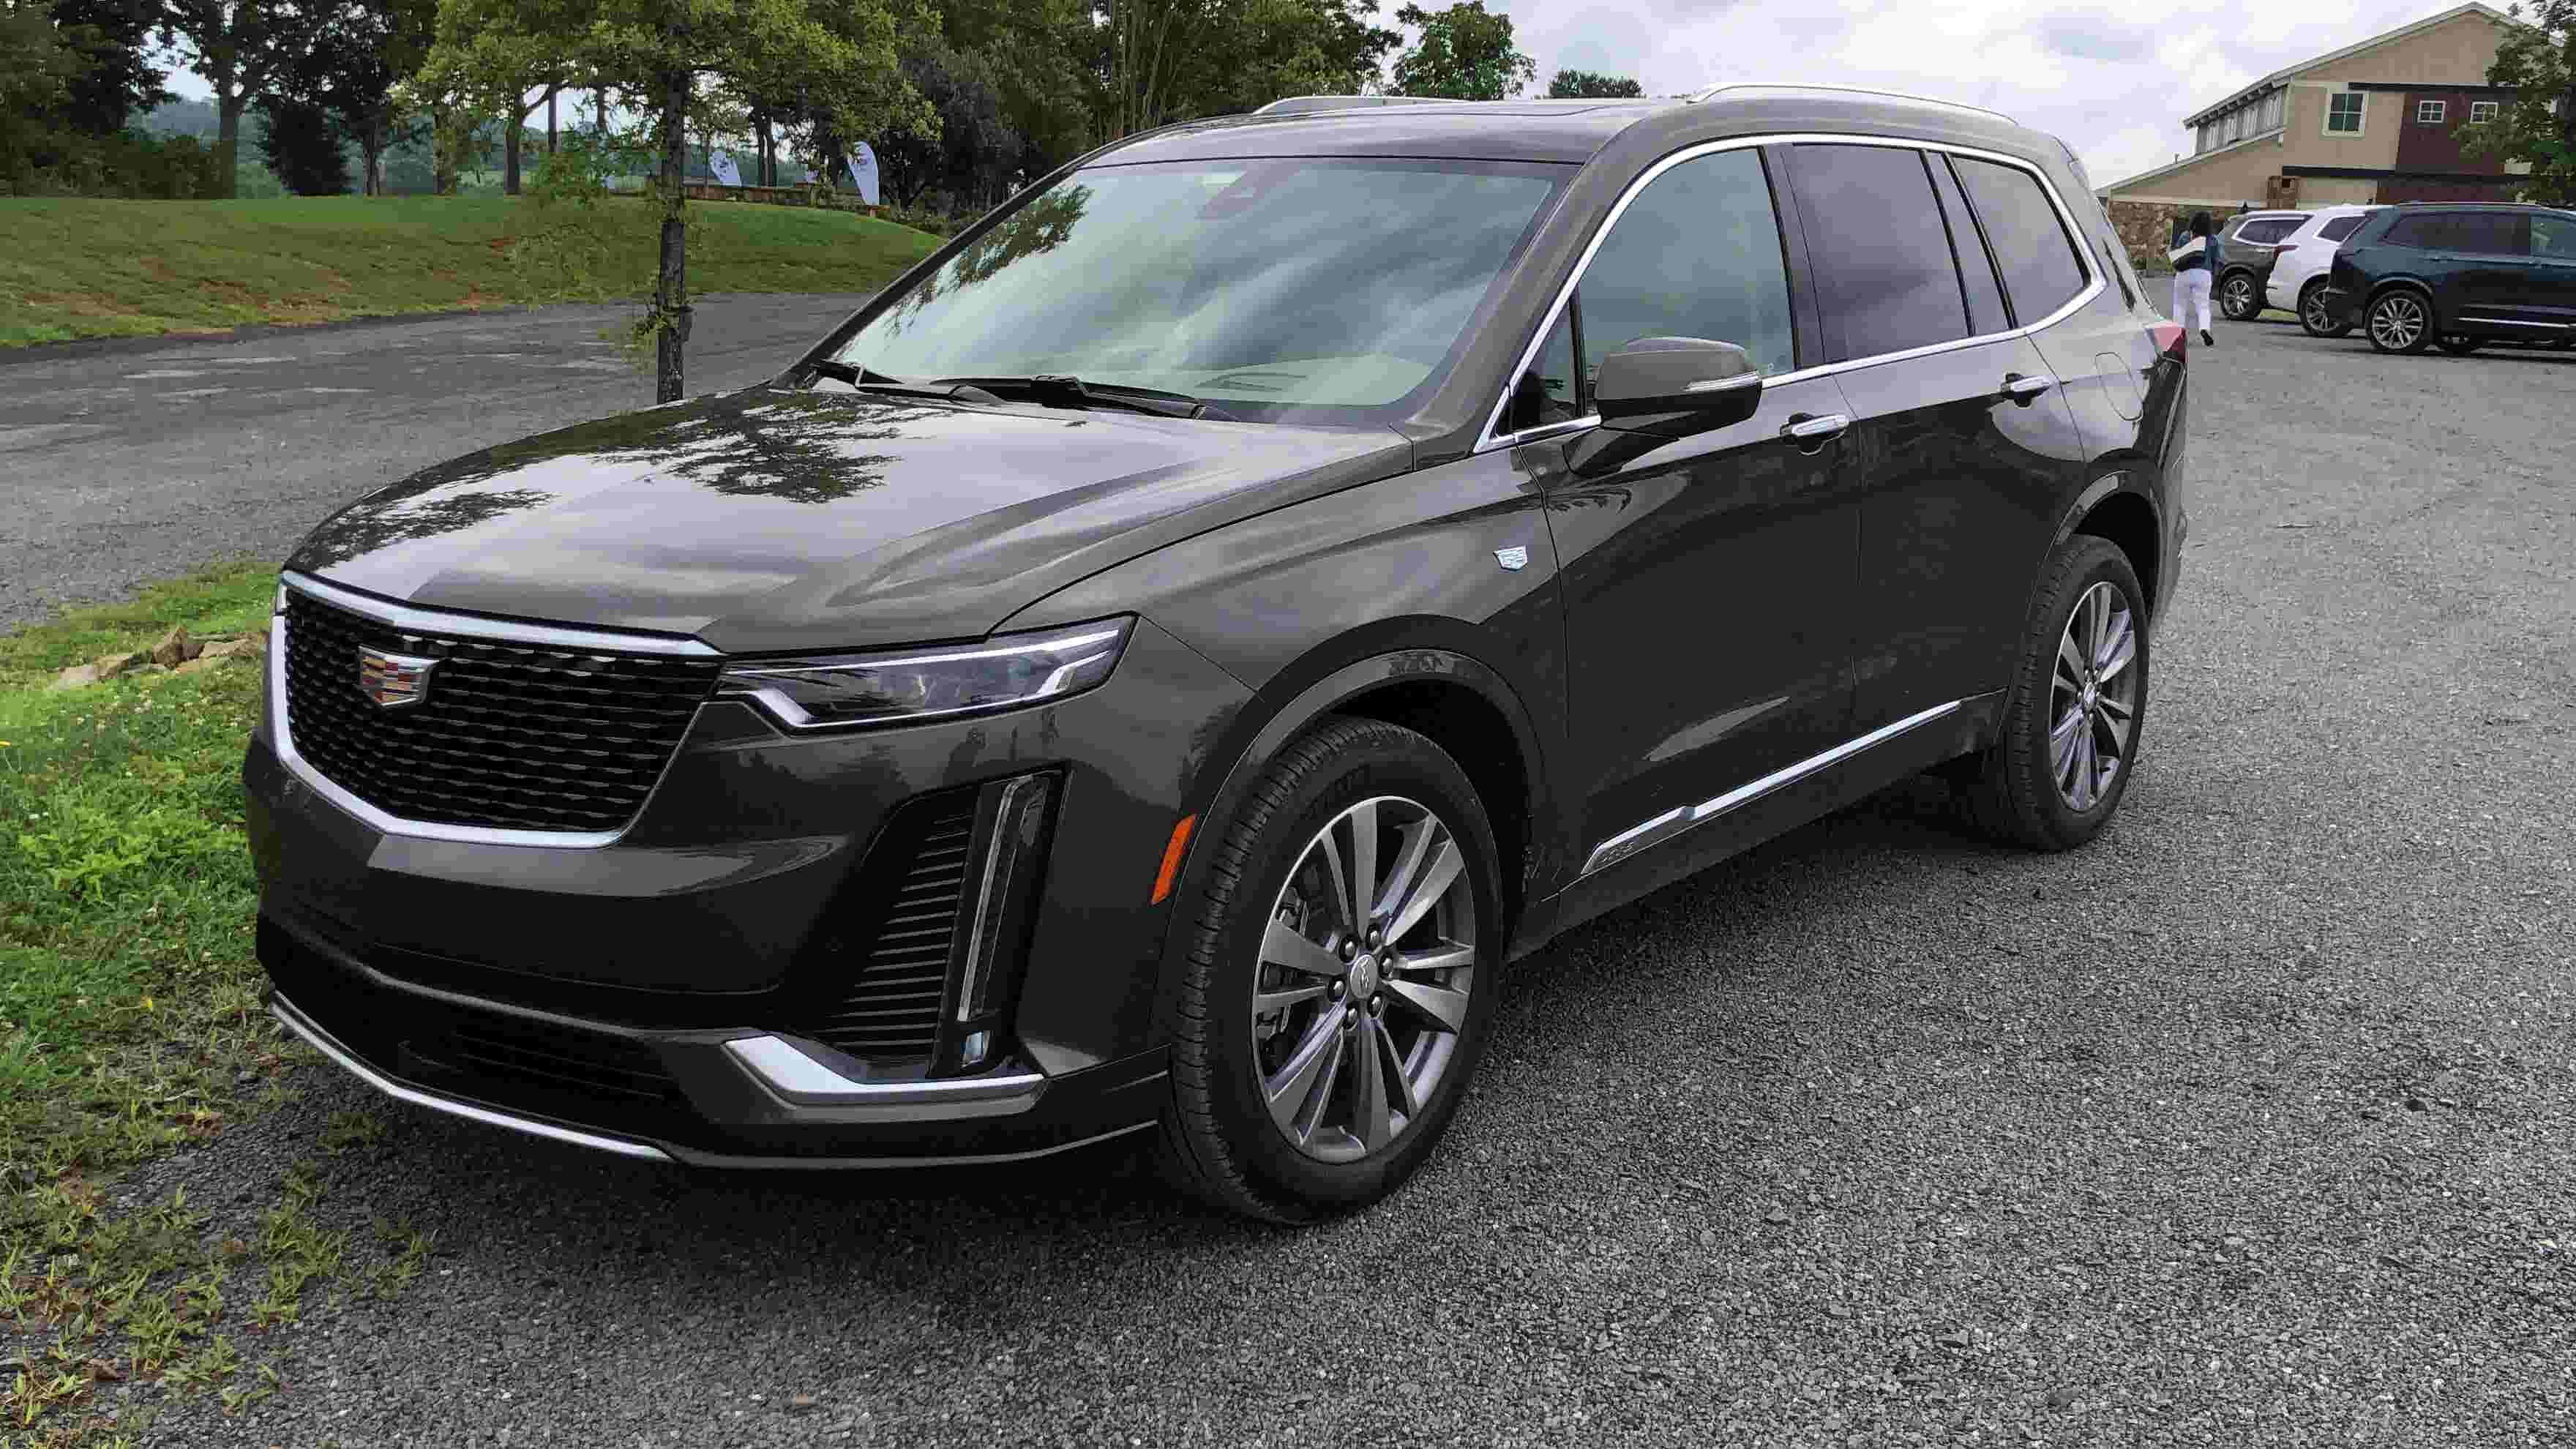 2019 Cadillac XT6: New Mid-Size 3-Row Crossover SUV >> 2020 Cadillac Xt6 Review 3 Row Suv Tackles Luxury Leaders